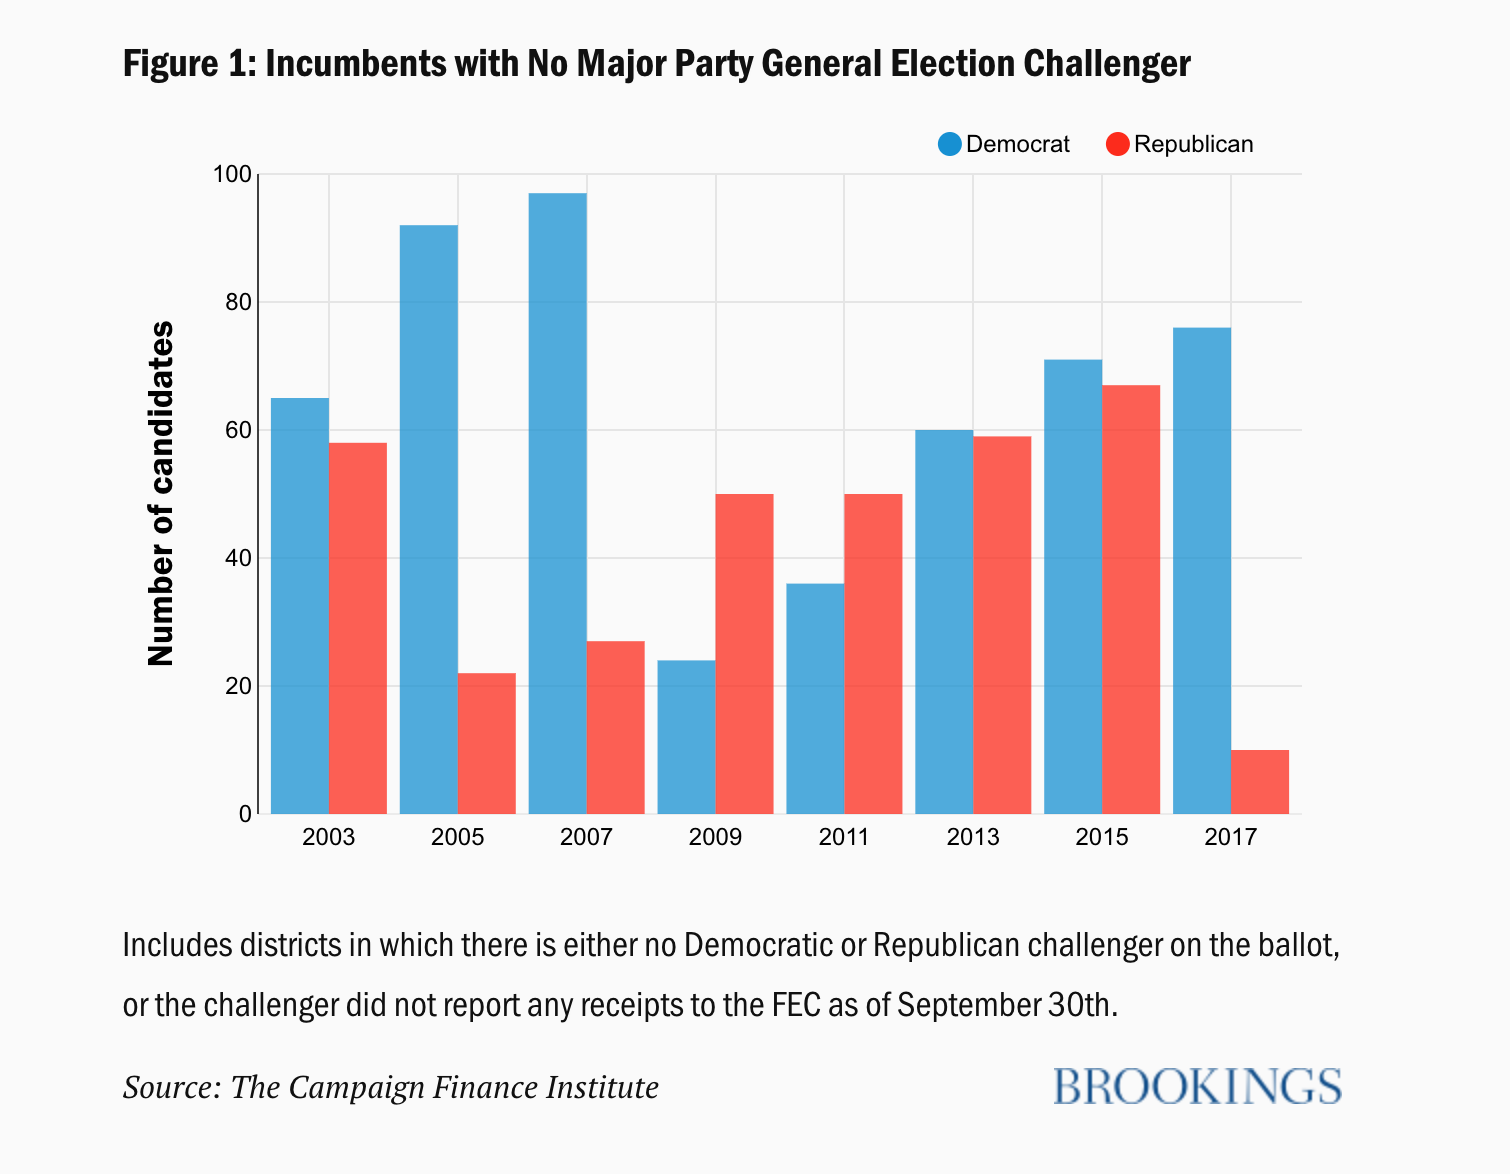 Brookings Data, I